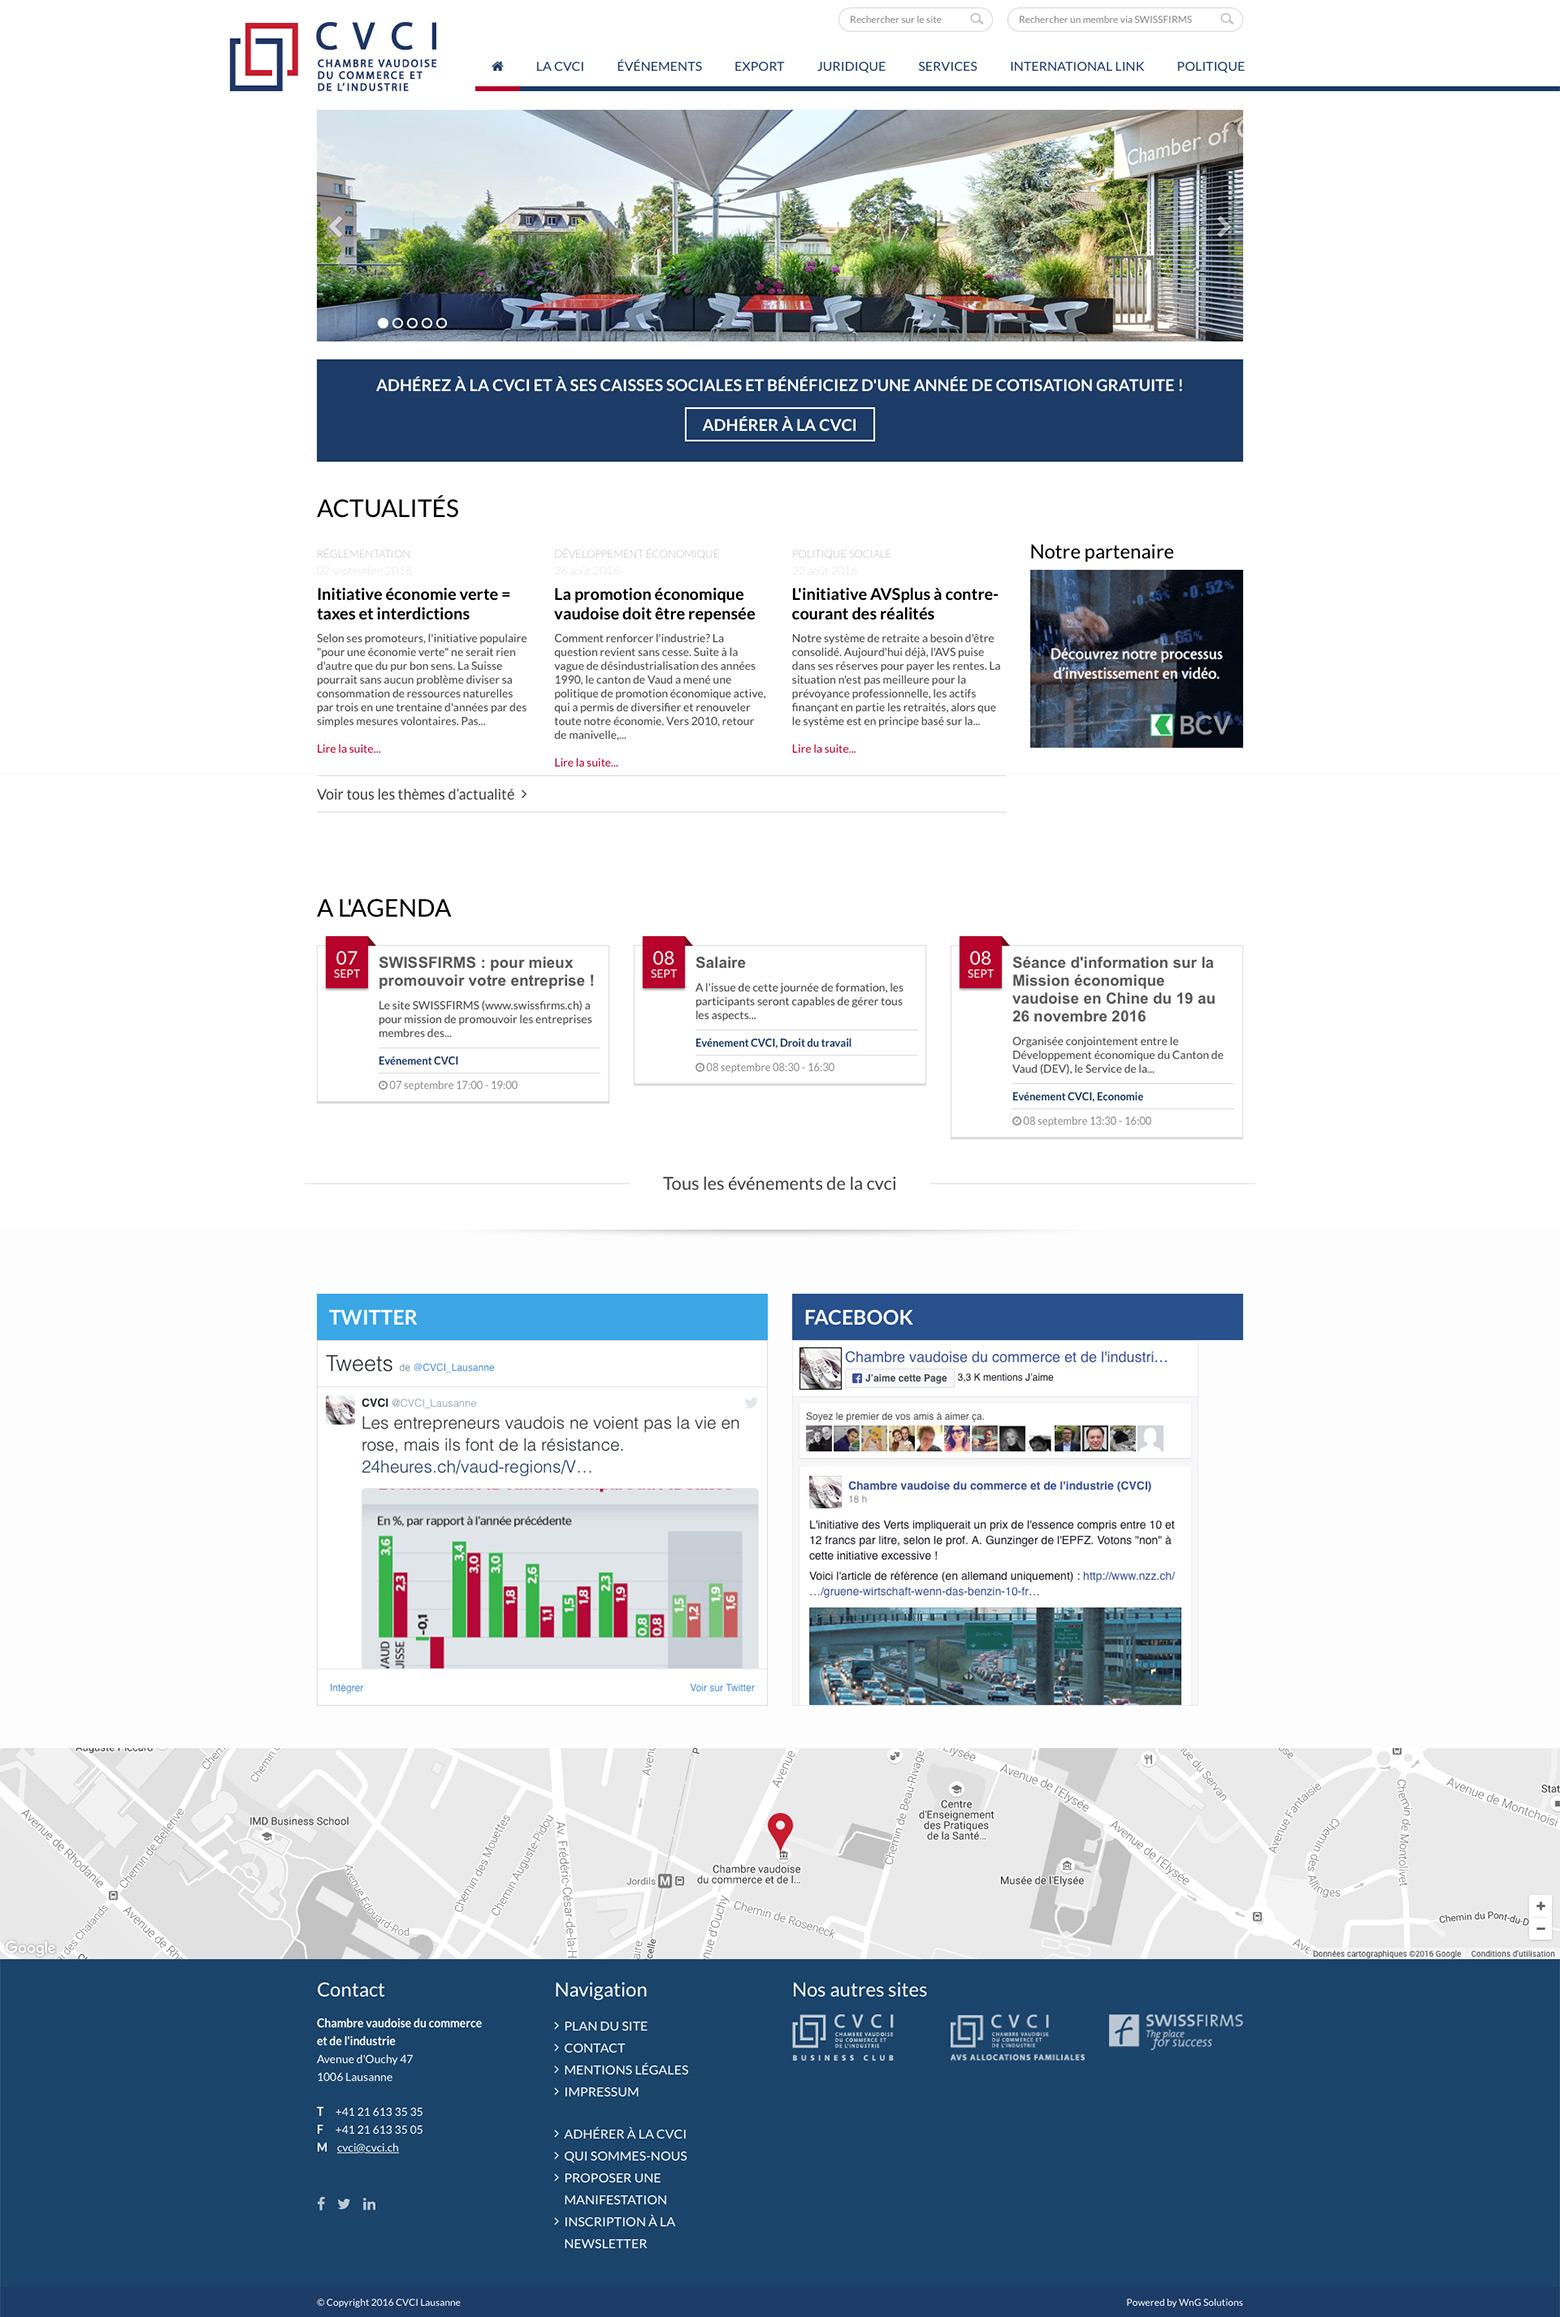 CVCI WNG Agence Digitale